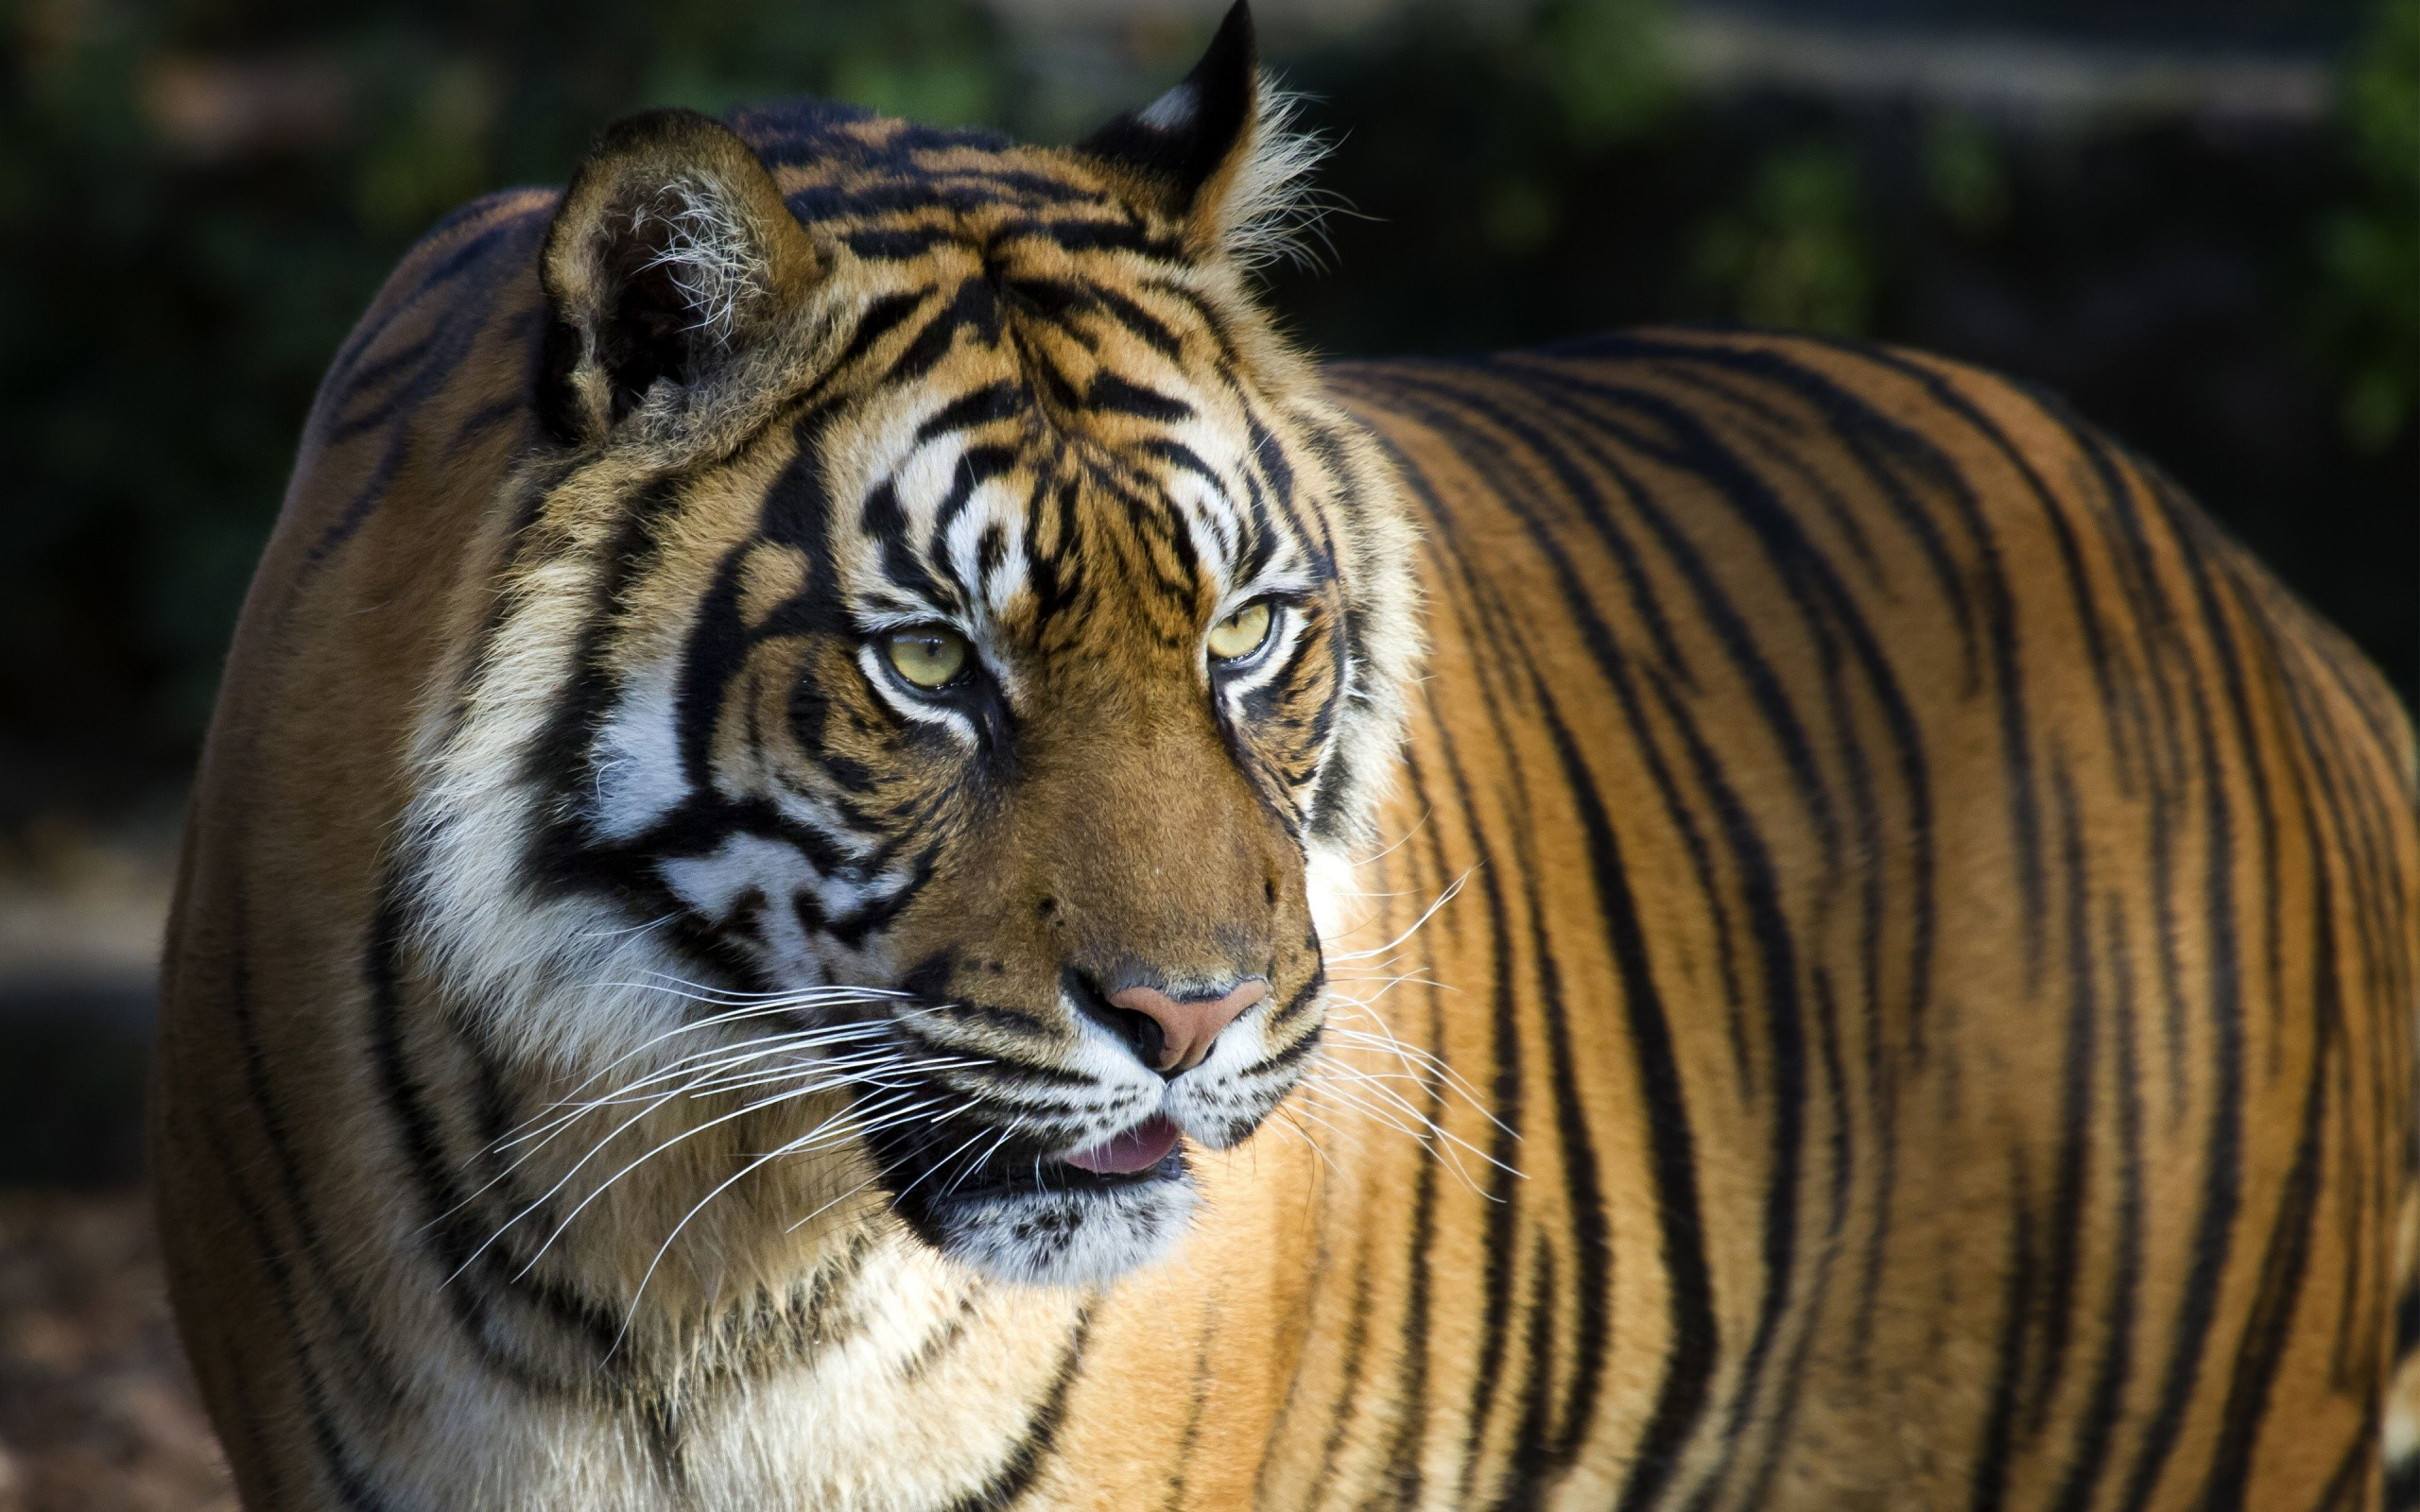 Fondos de pantalla Tigre de bengala